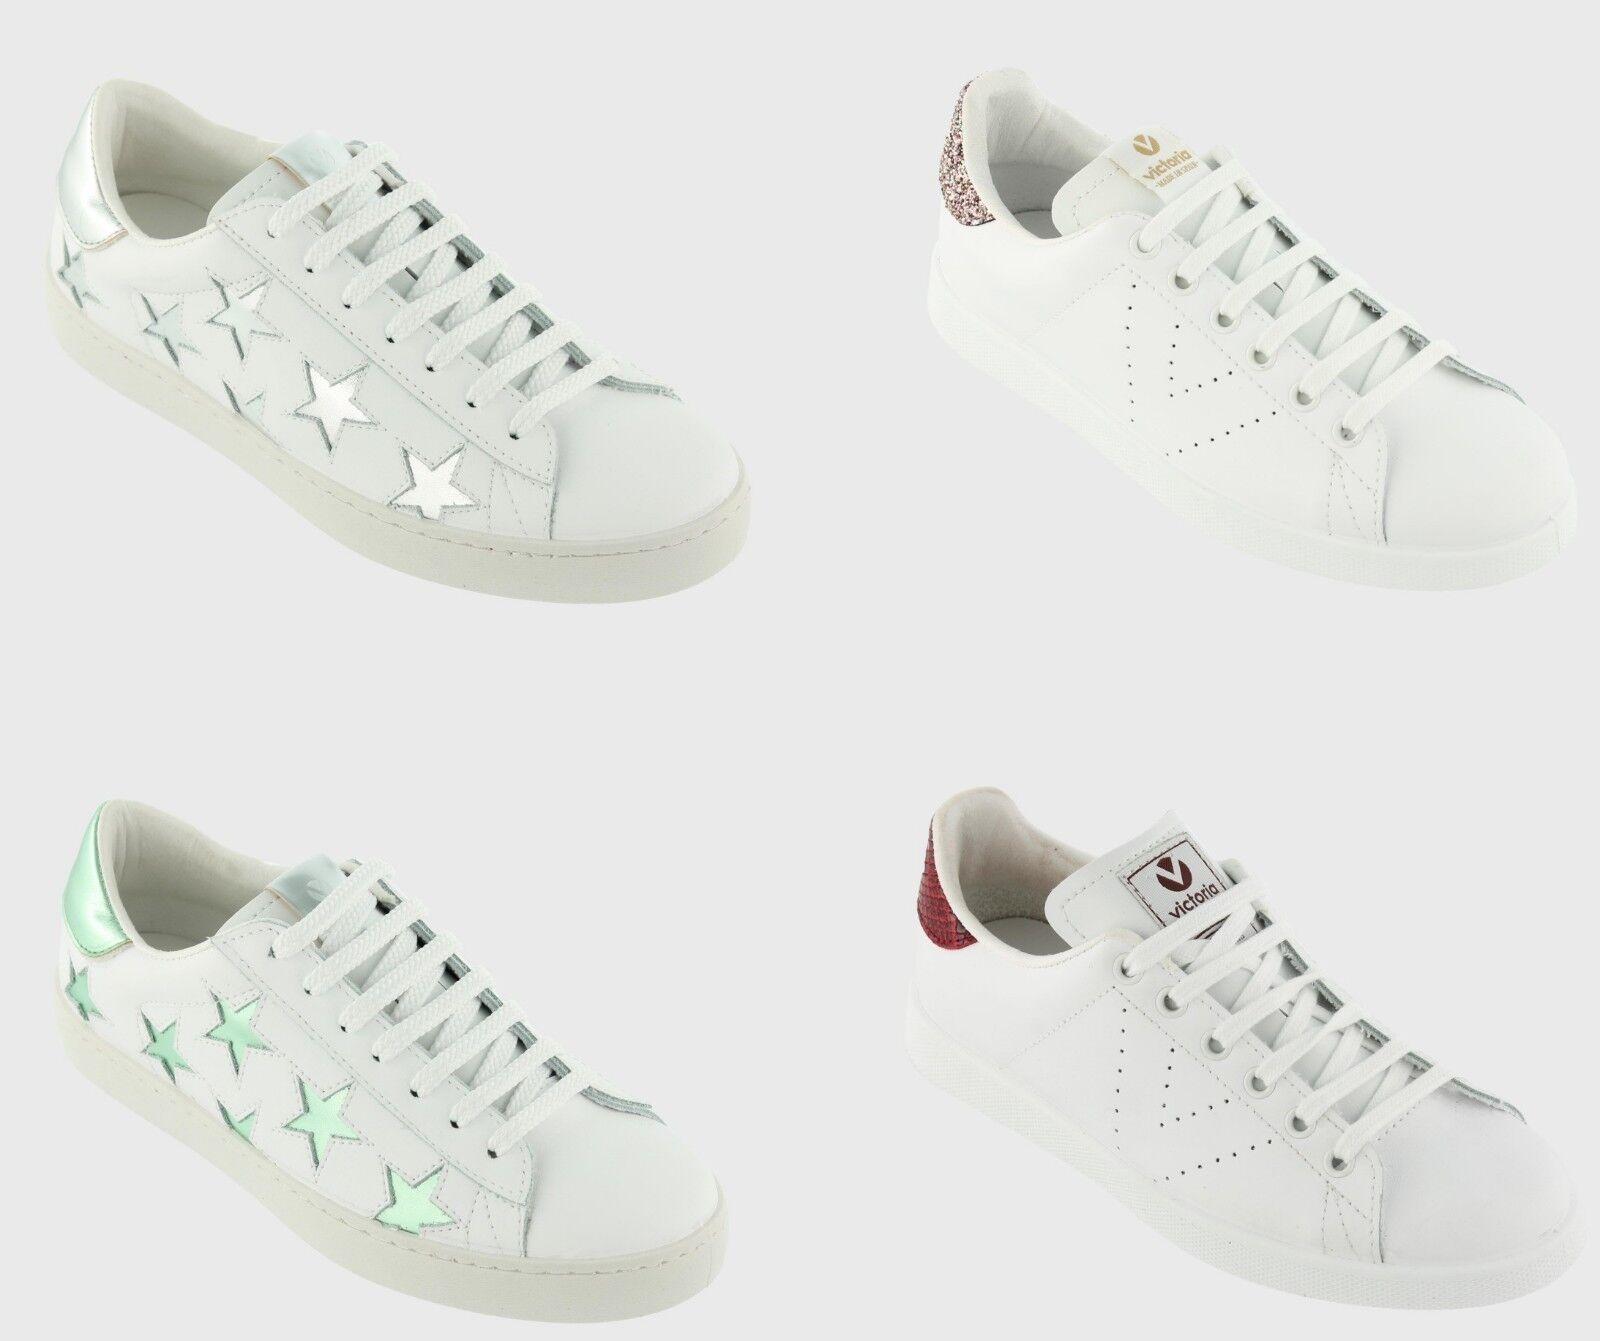 NEW Victoria Wouomo Leather Glitter Lace Up Tennis scarpe Casual scarpe da ginnastica bianca